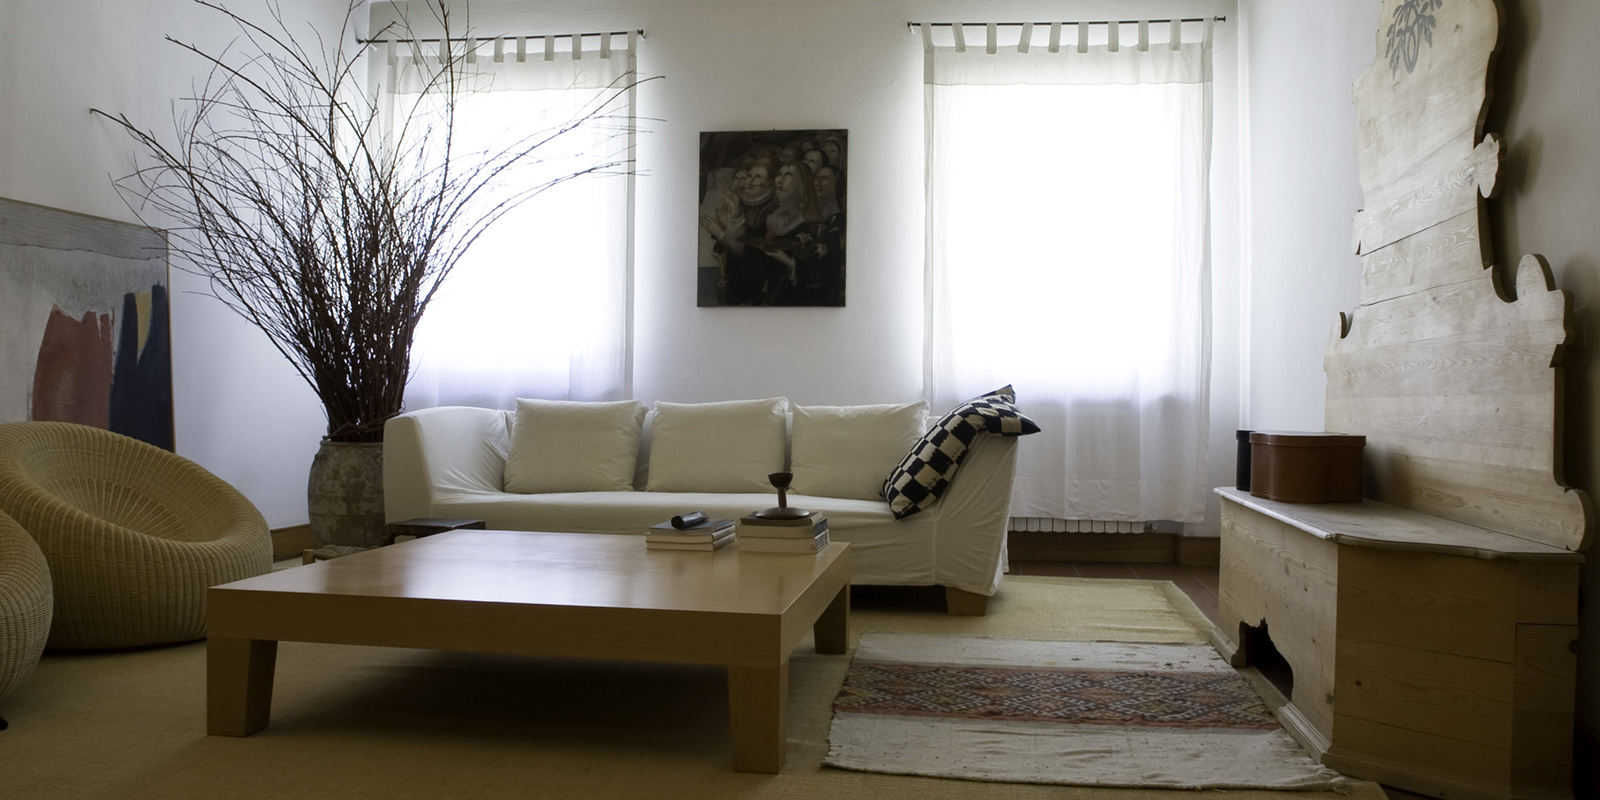 Tonuccidesign design a pesaro for Arredamento made in china